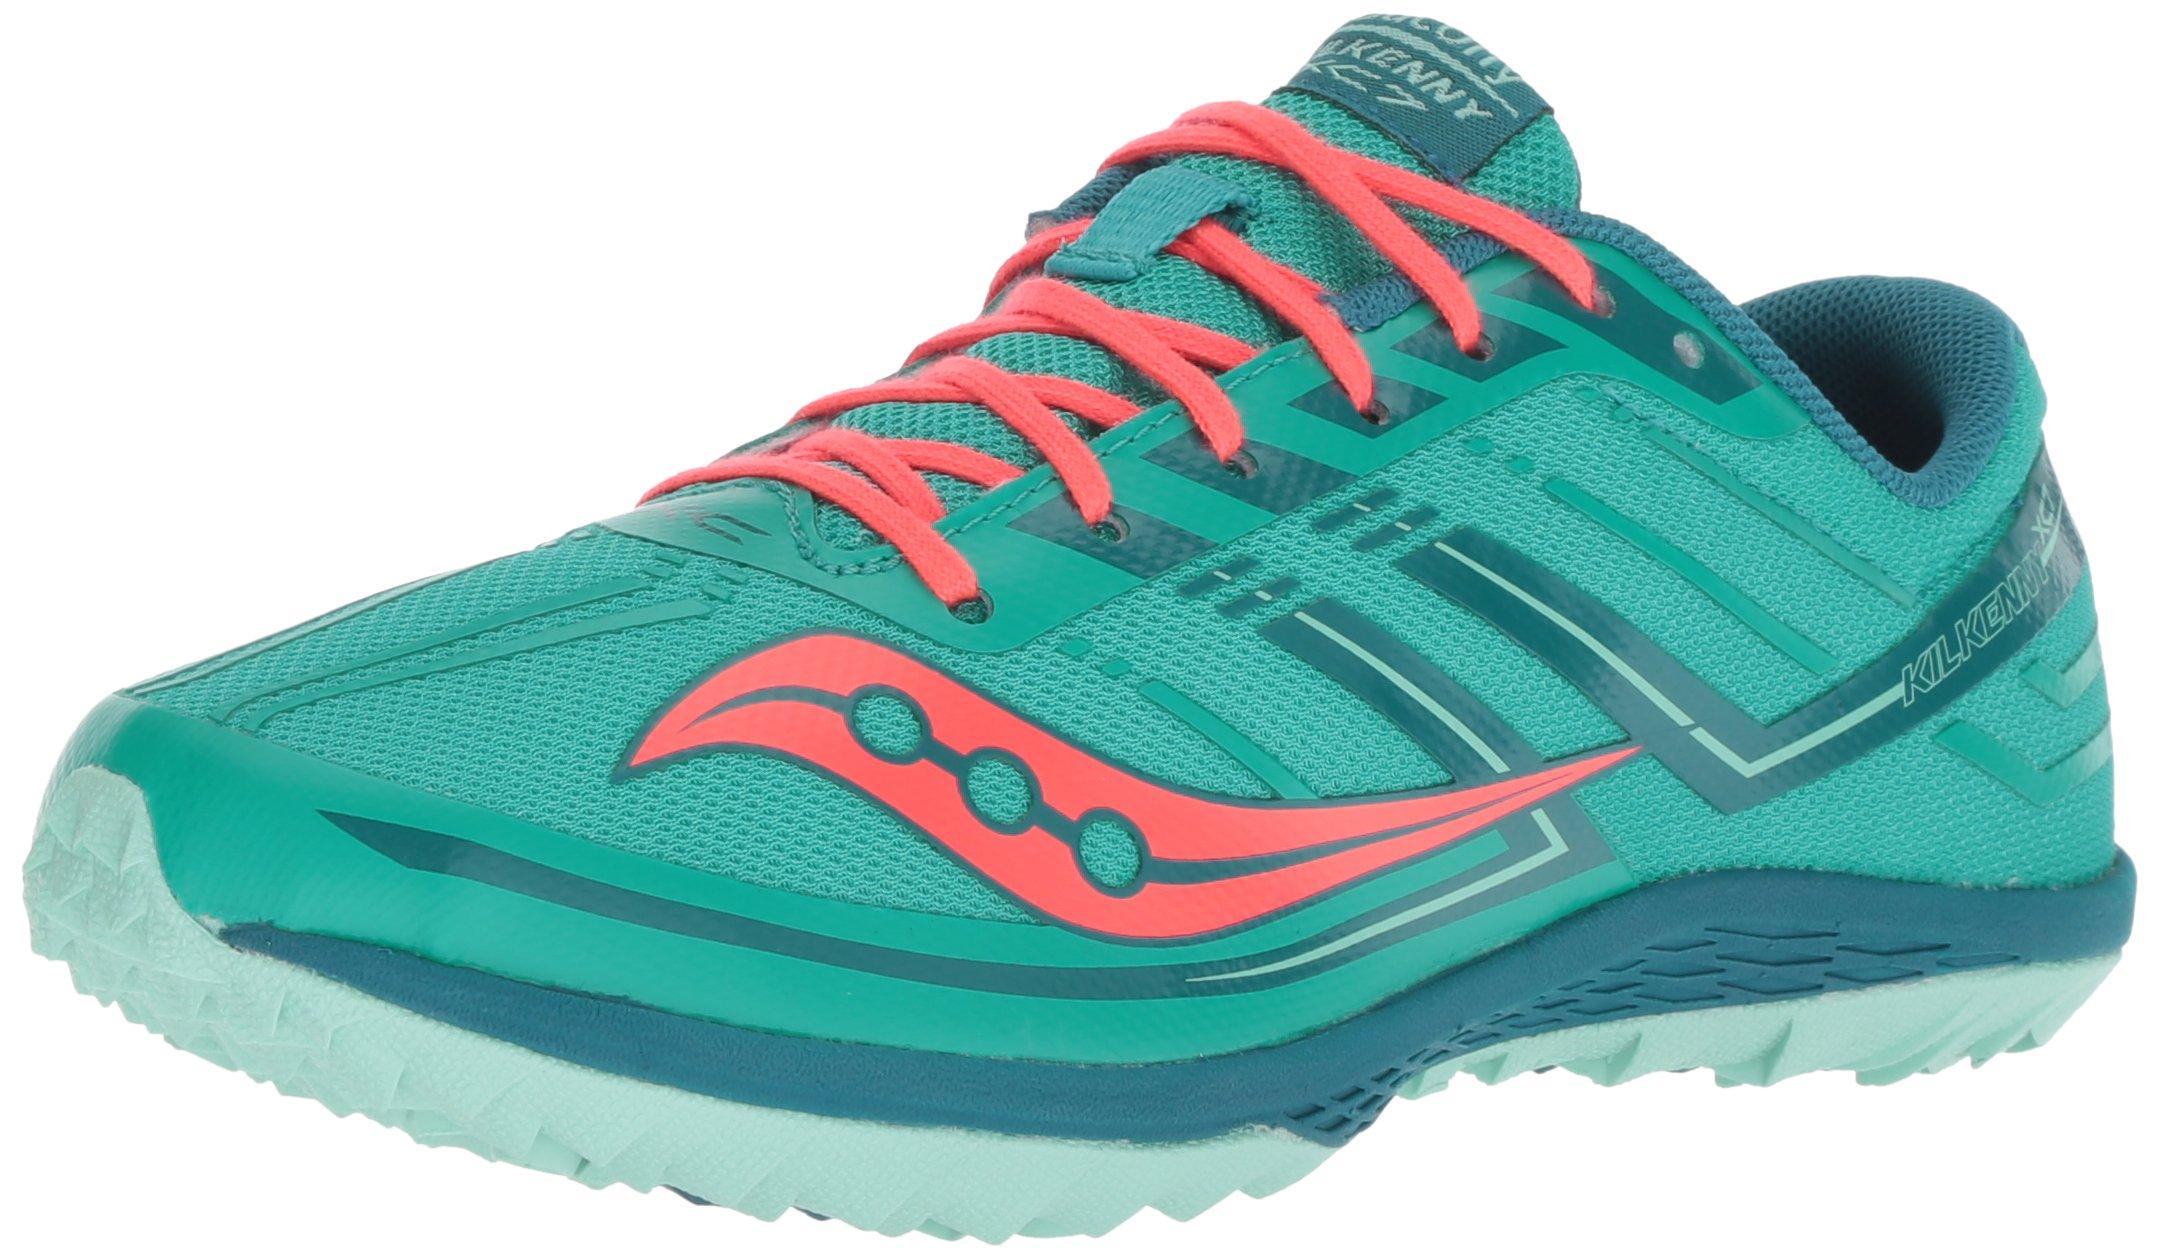 Saucony Women's Kilkenny XC 7 Flat Cross Country Running Shoe